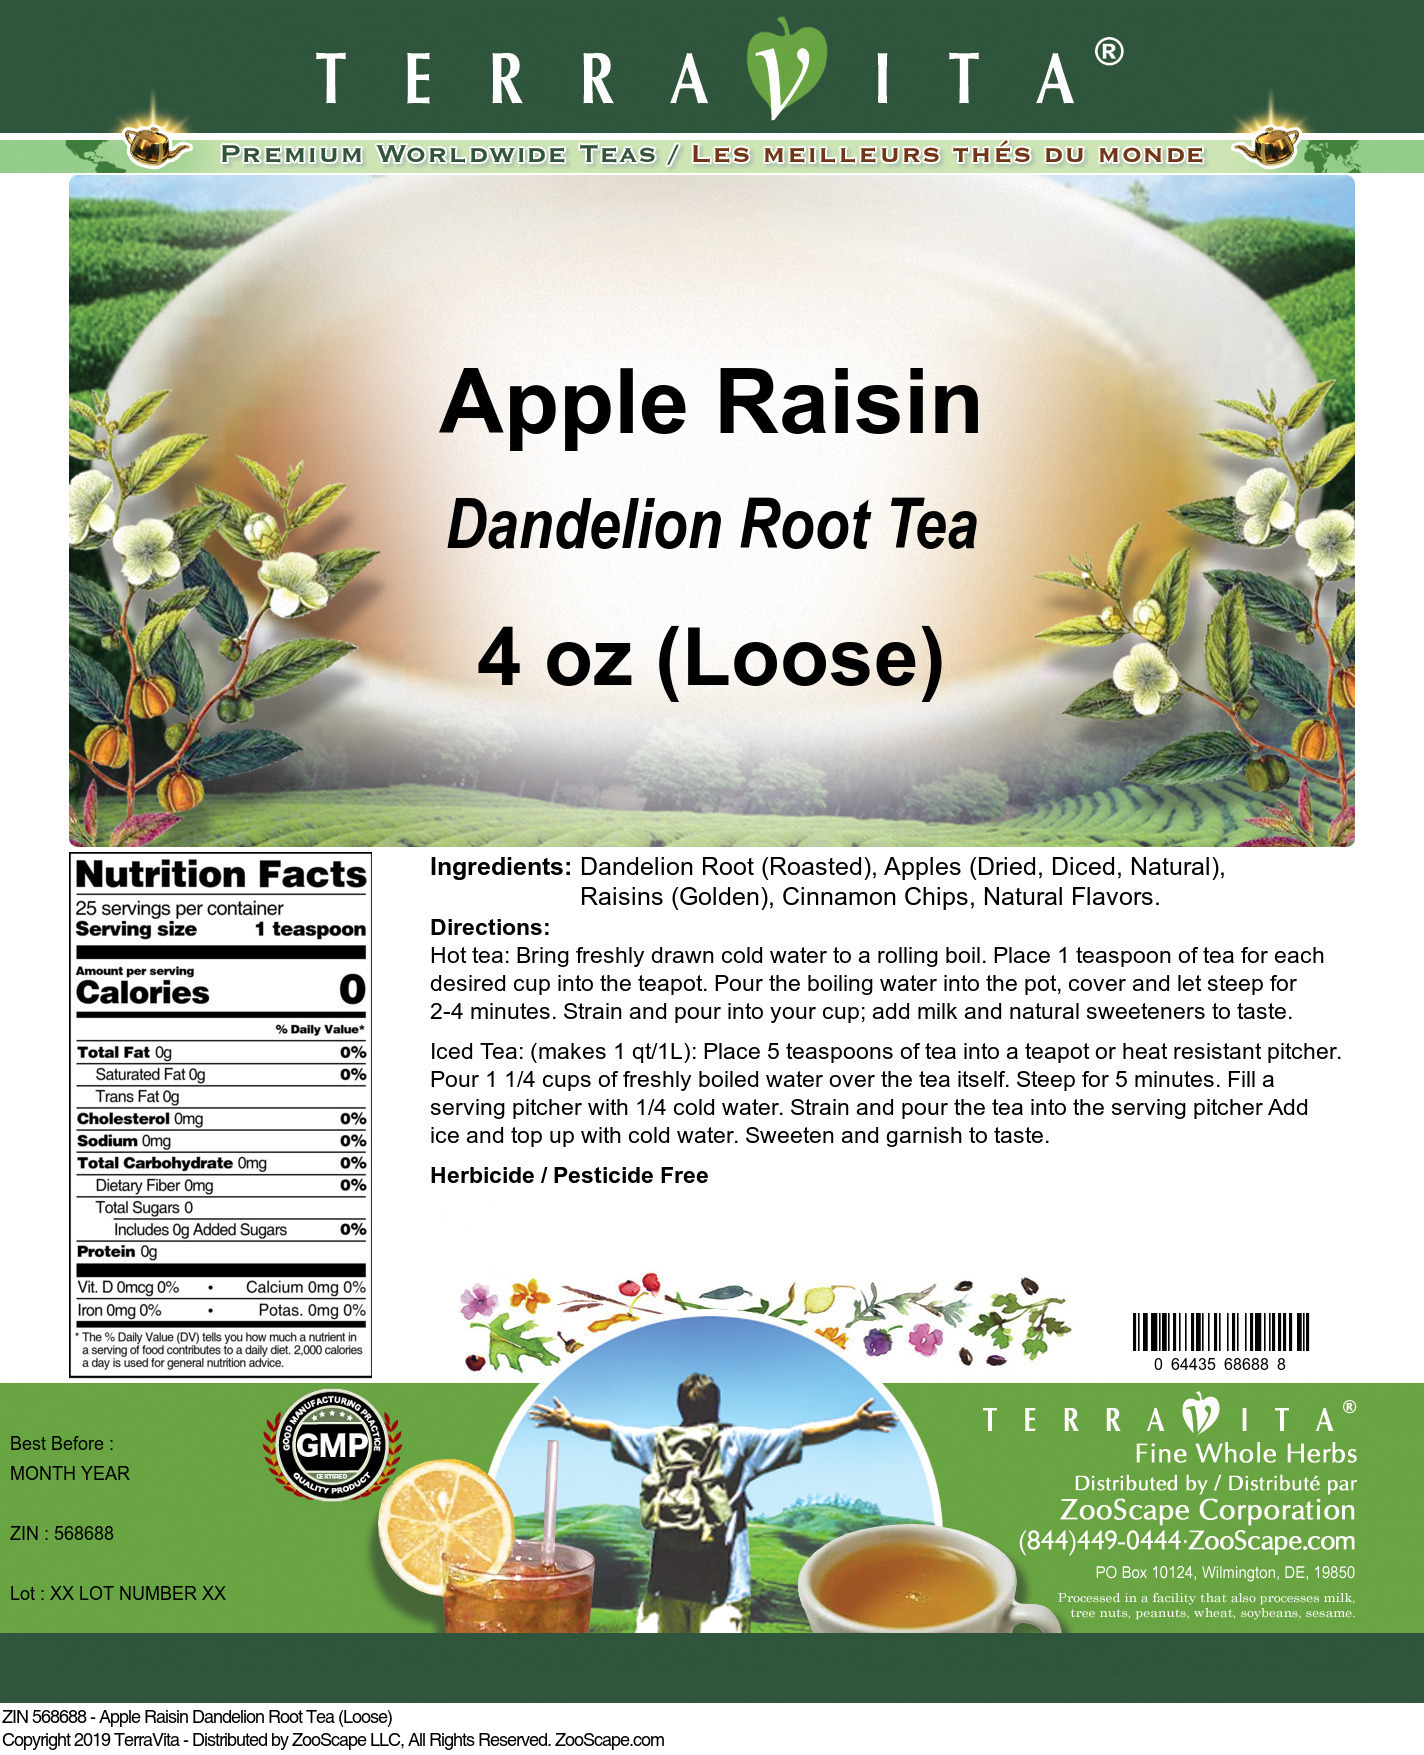 Apple Raisin Dandelion Root Tea (Loose)